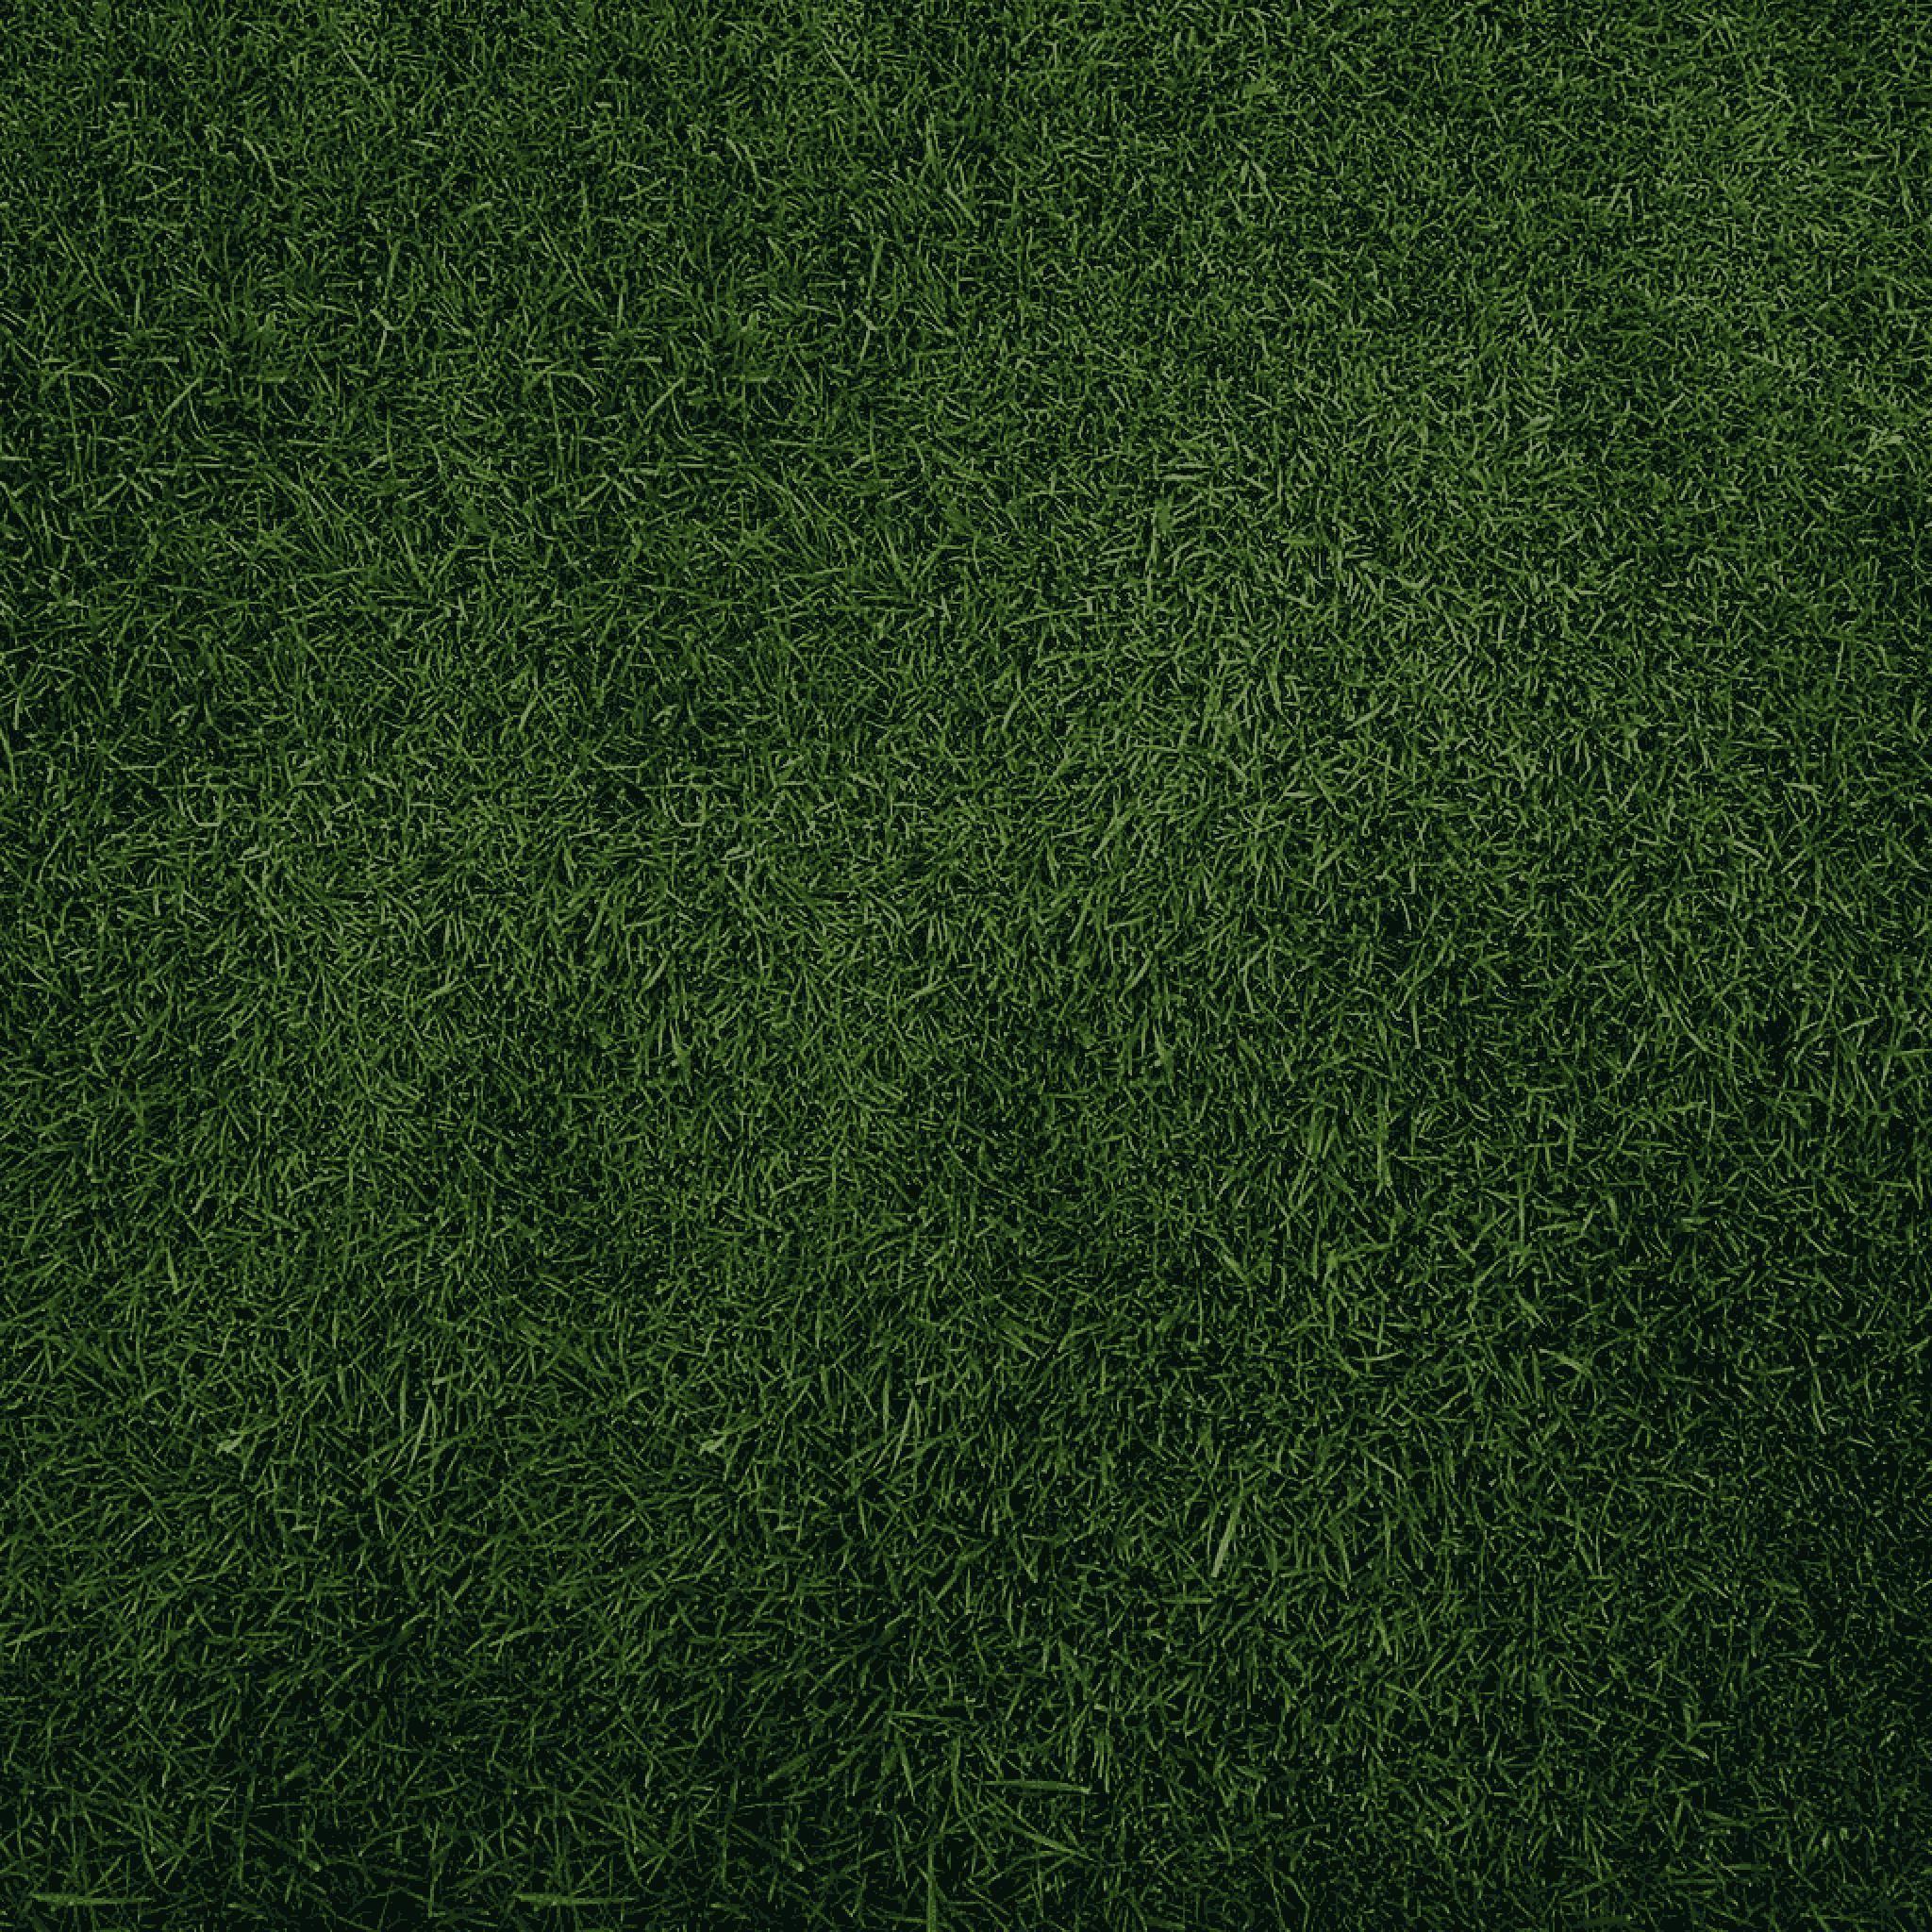 Plain Lime Green Wallpaper wallpaper hd